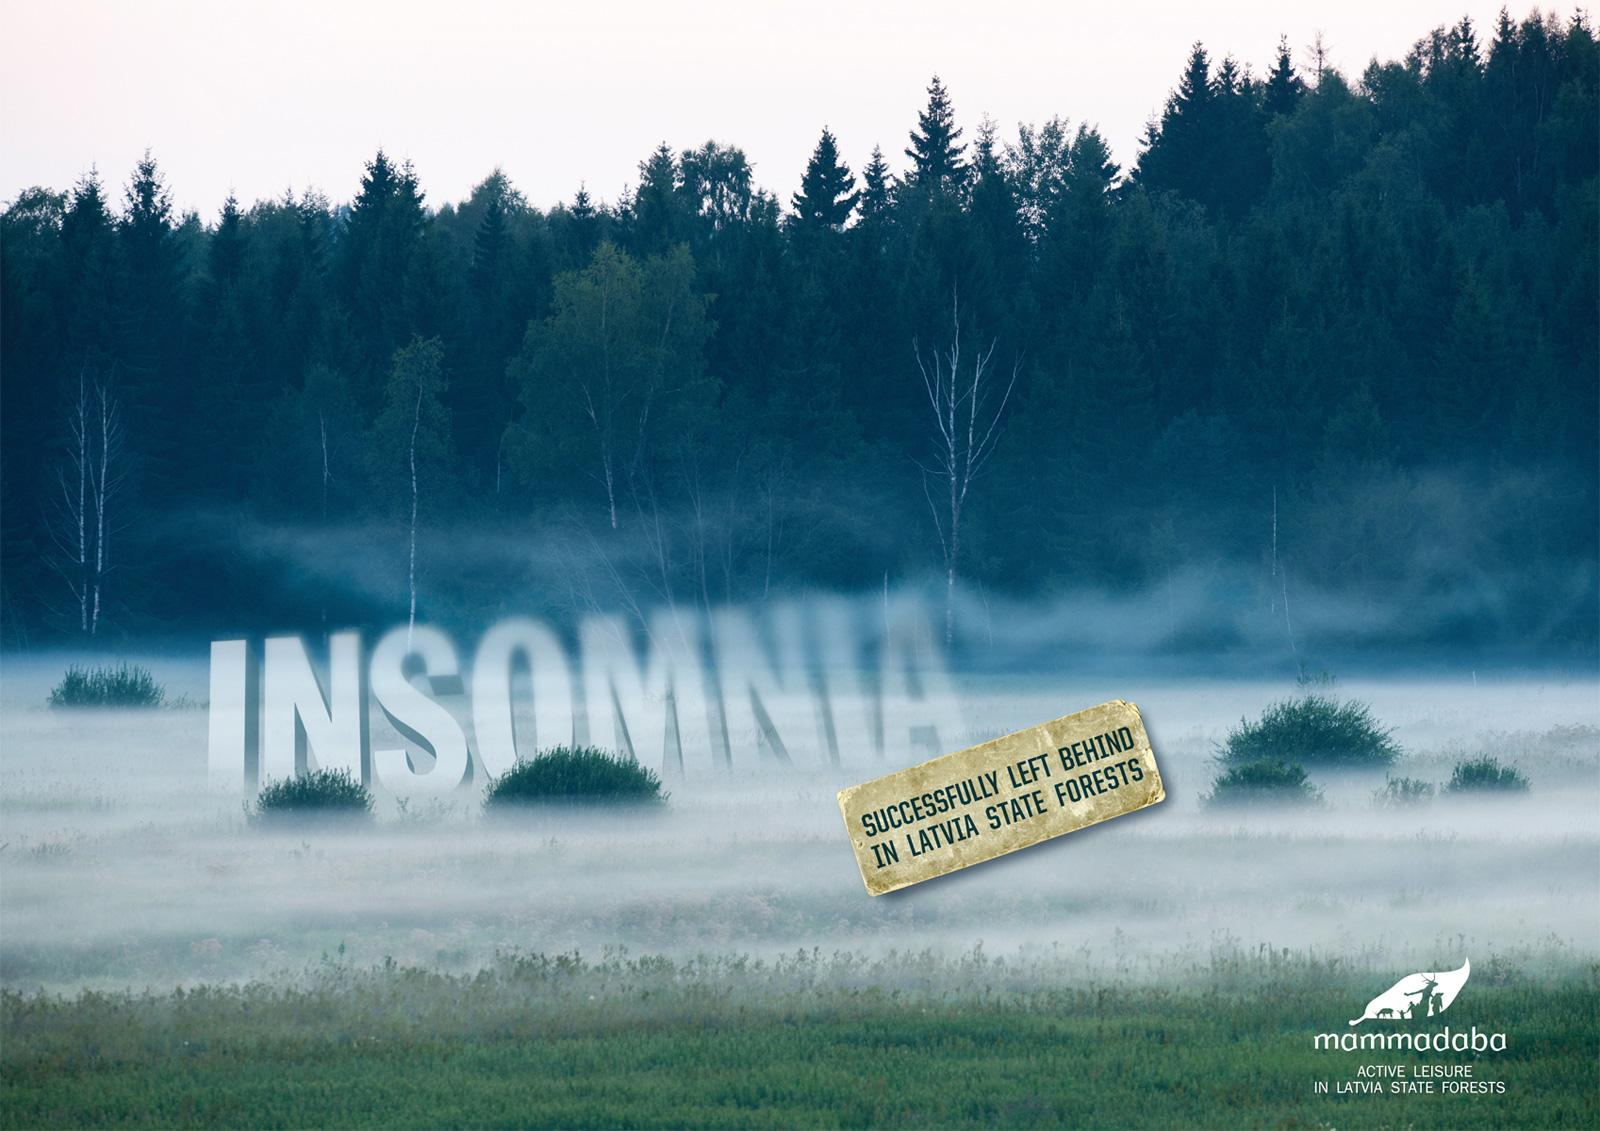 Mammadaba Print Ad -  Insomnia